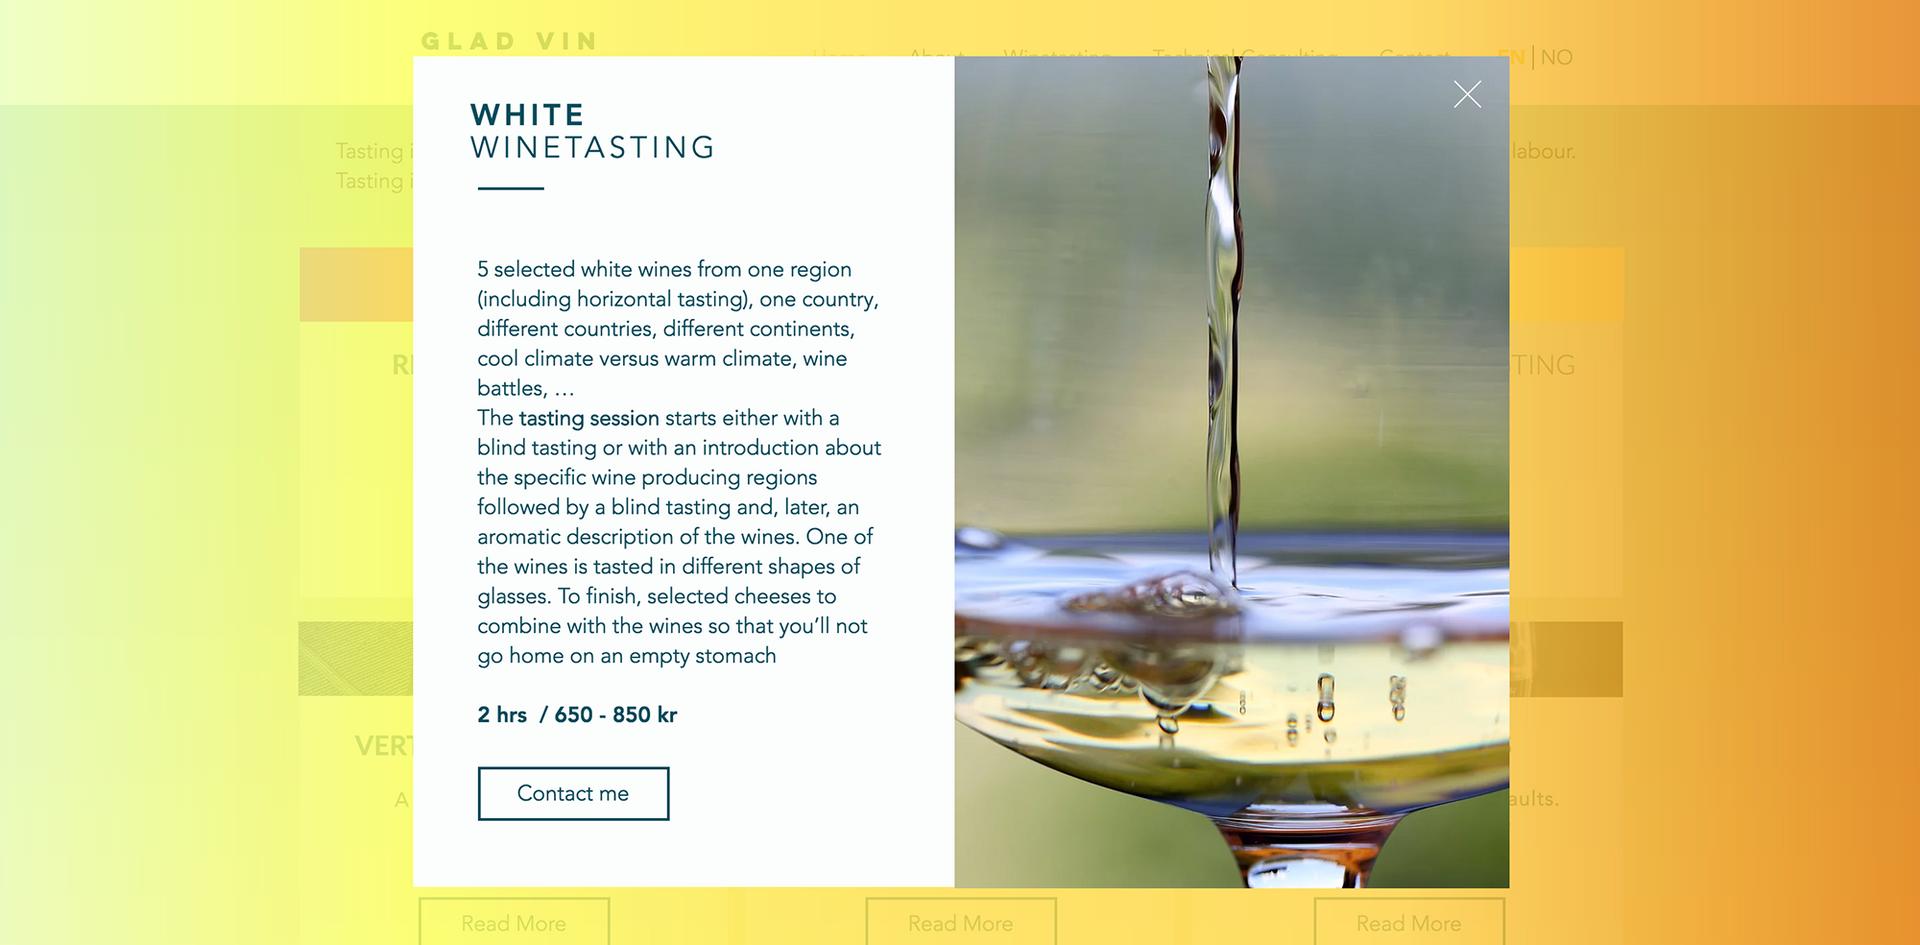 white winetasting